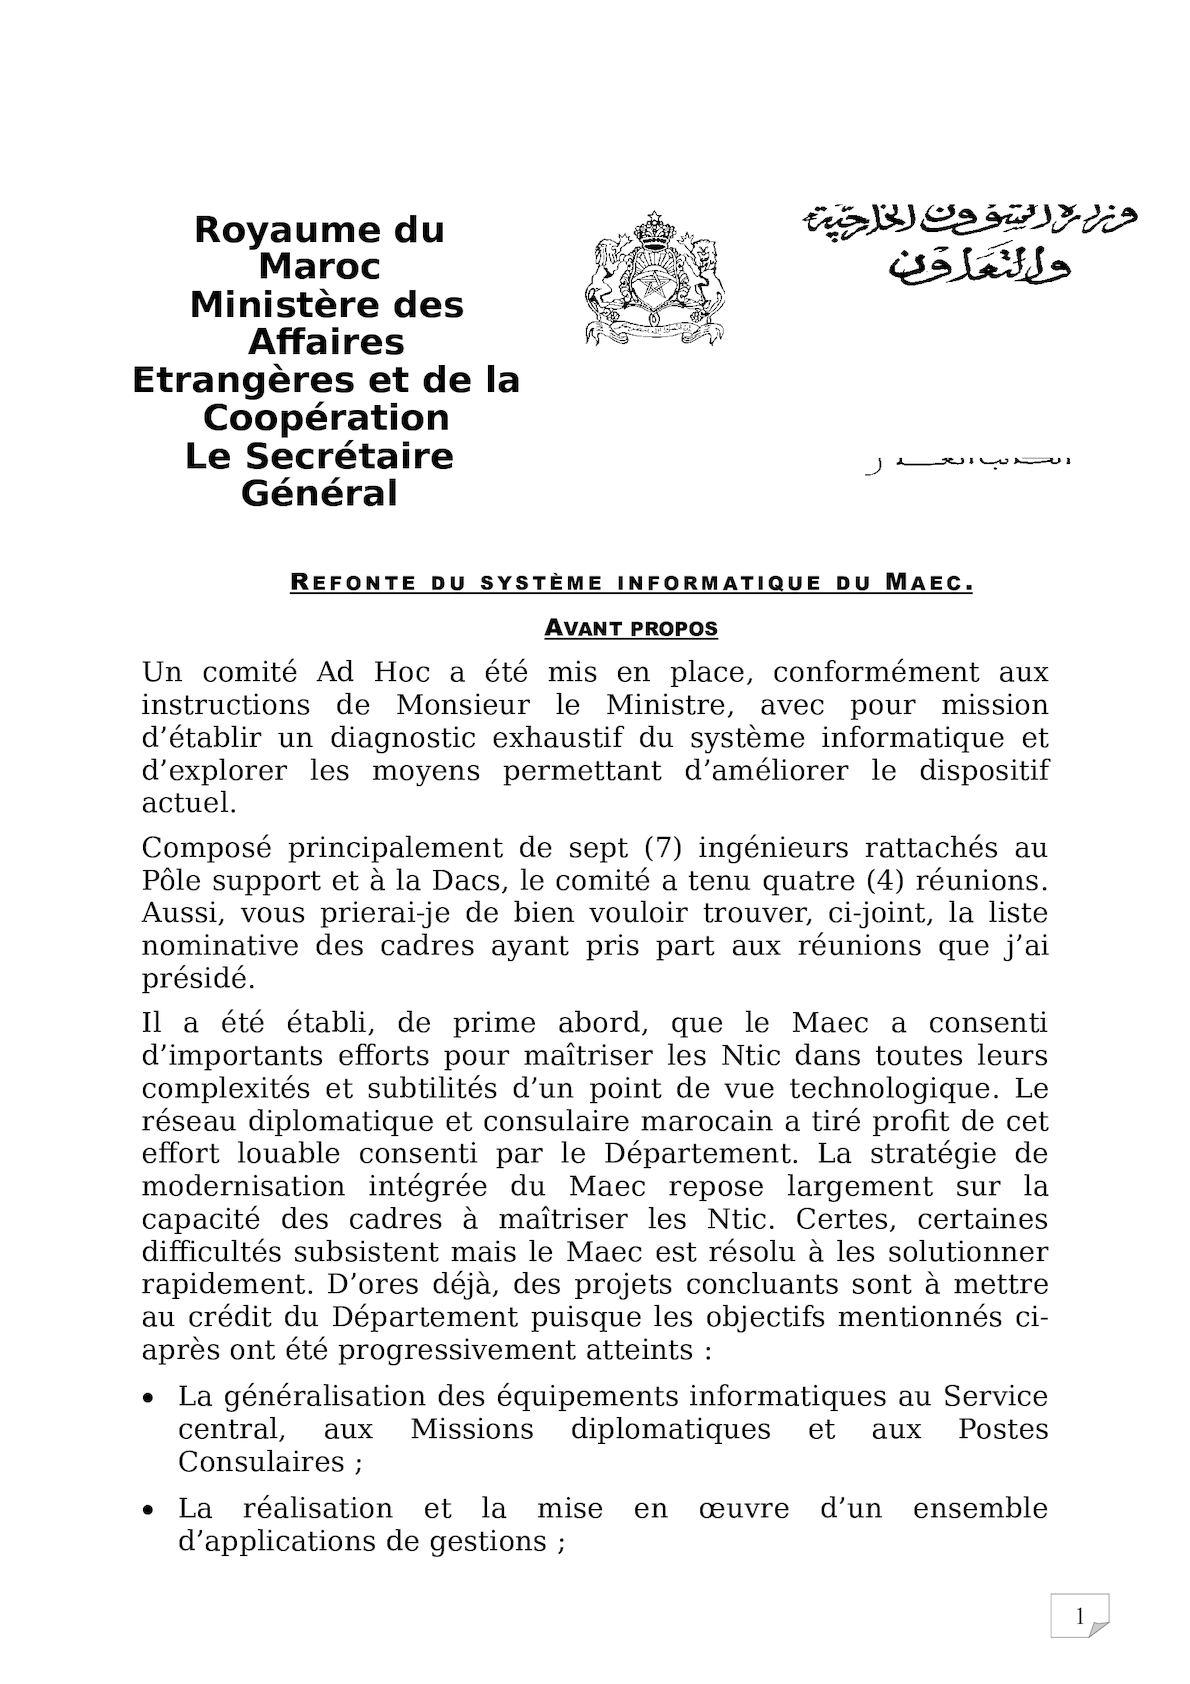 Refonte Du Dsi Maec Note25 10 2010 Finale